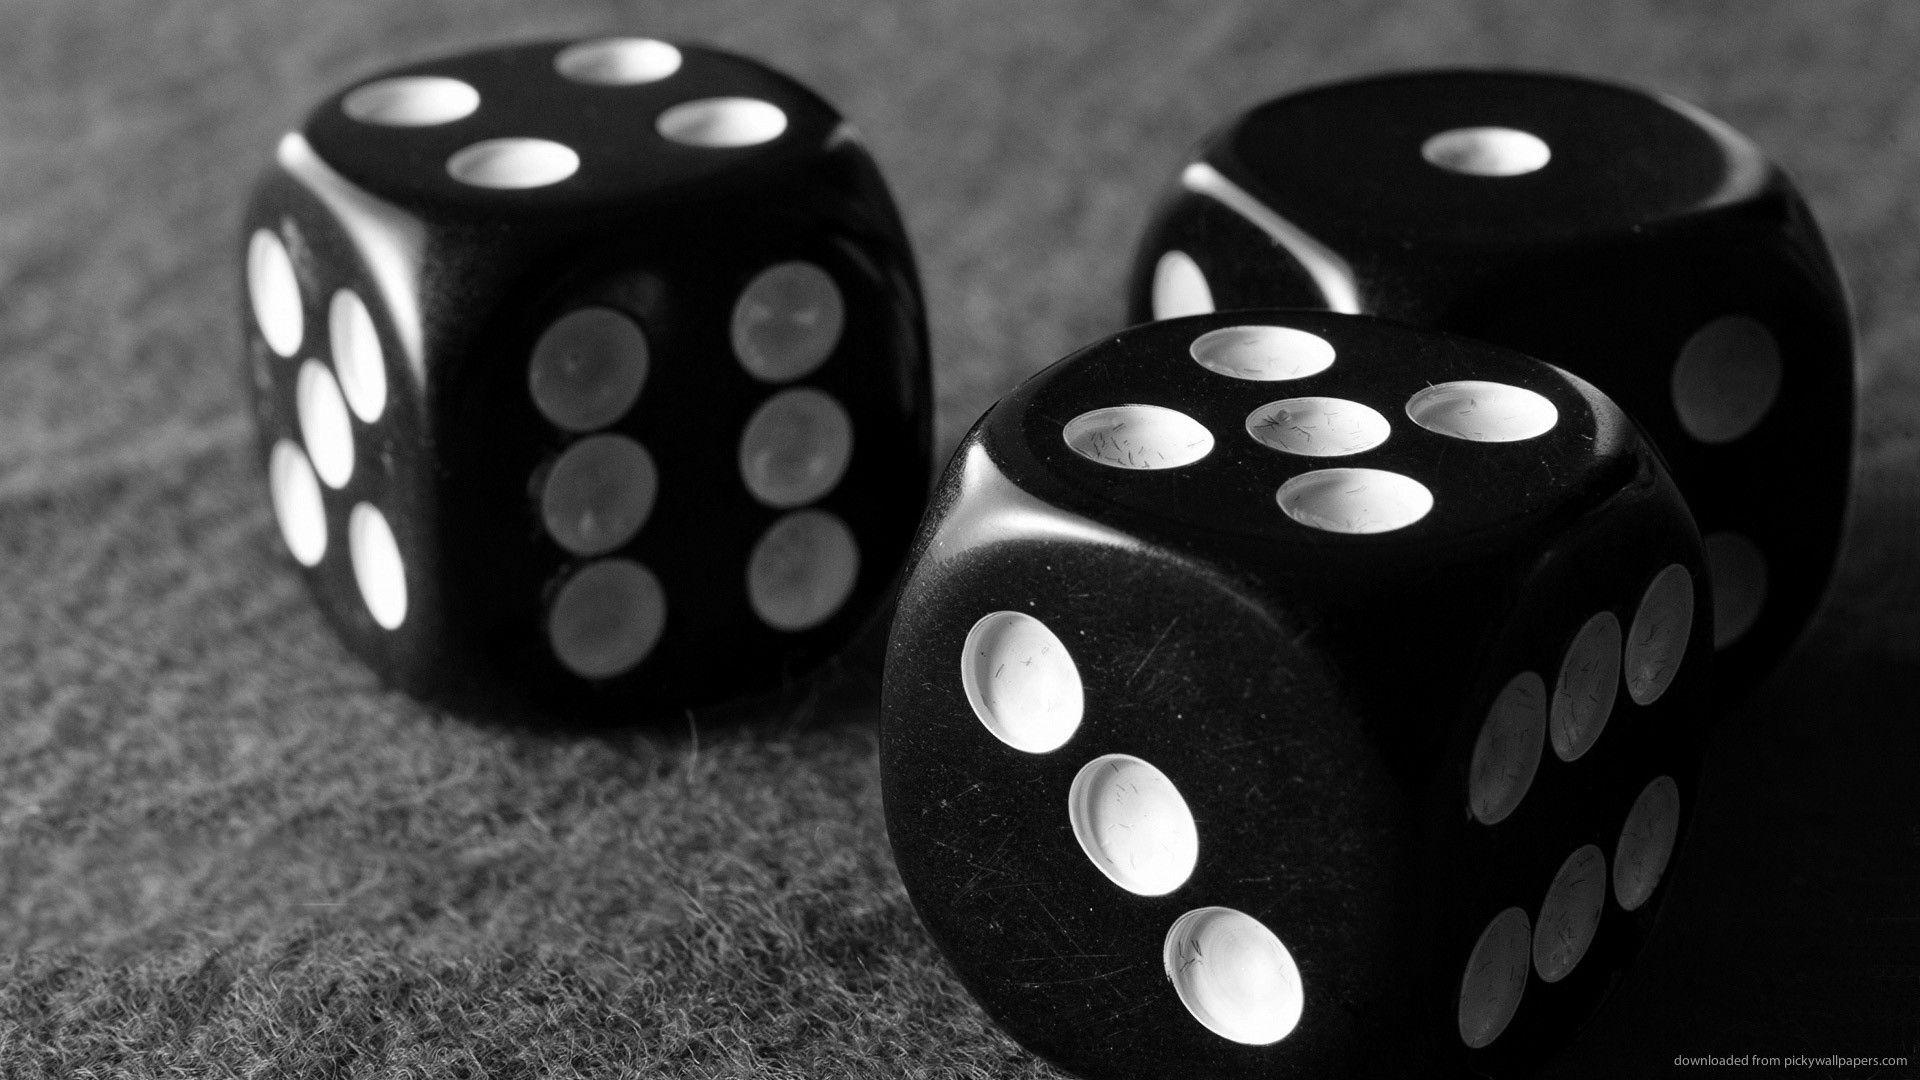 pics of dice hd